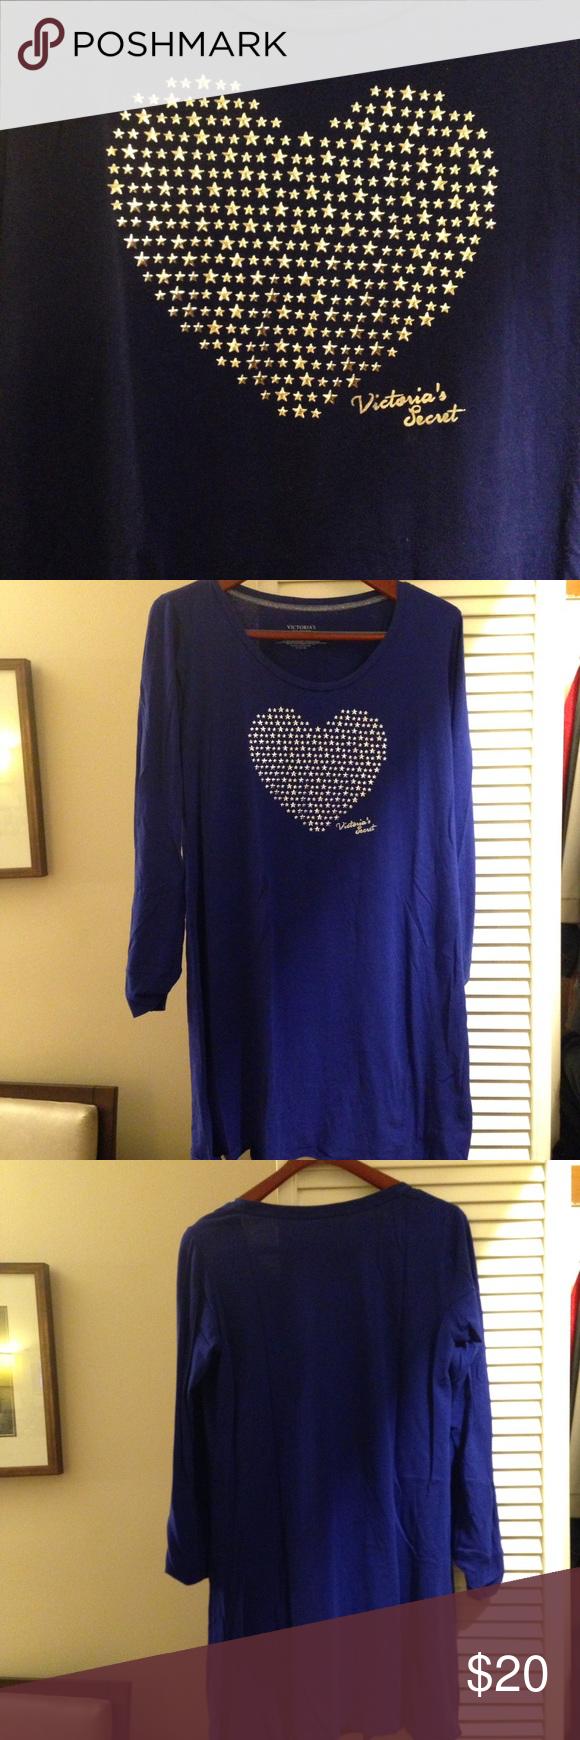 💟 Victoria's Secret sleep shirt 💟 EUC - Extremely soft and comfy! Cotton blend, machine washable. Victoria's Secret Intimates & Sleepwear